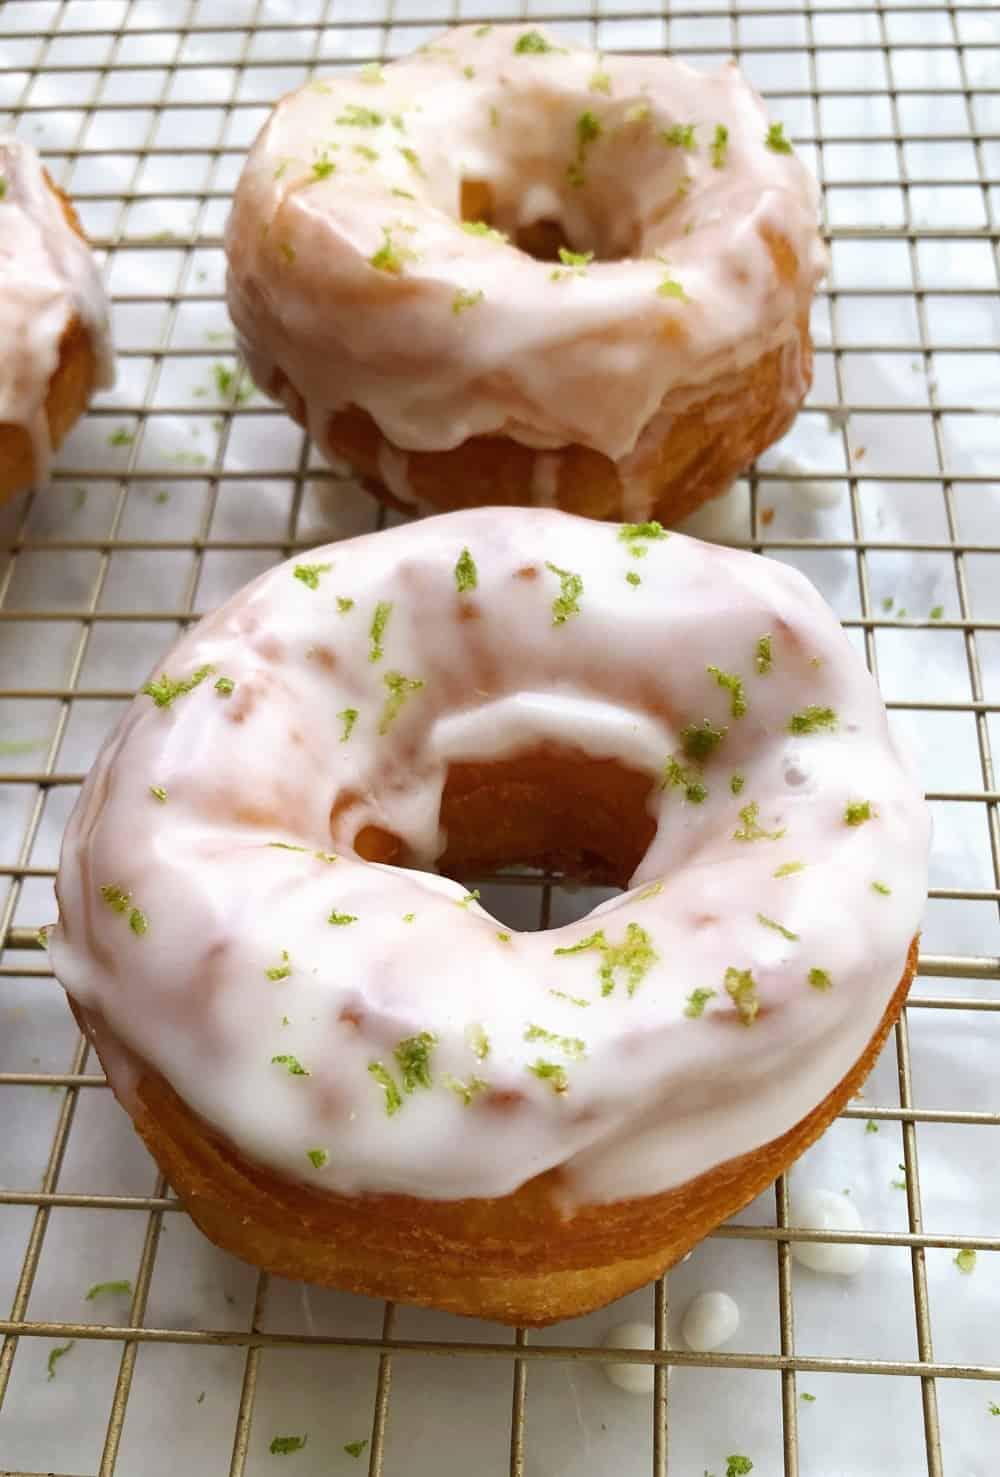 Margarita-glazed doughnuts